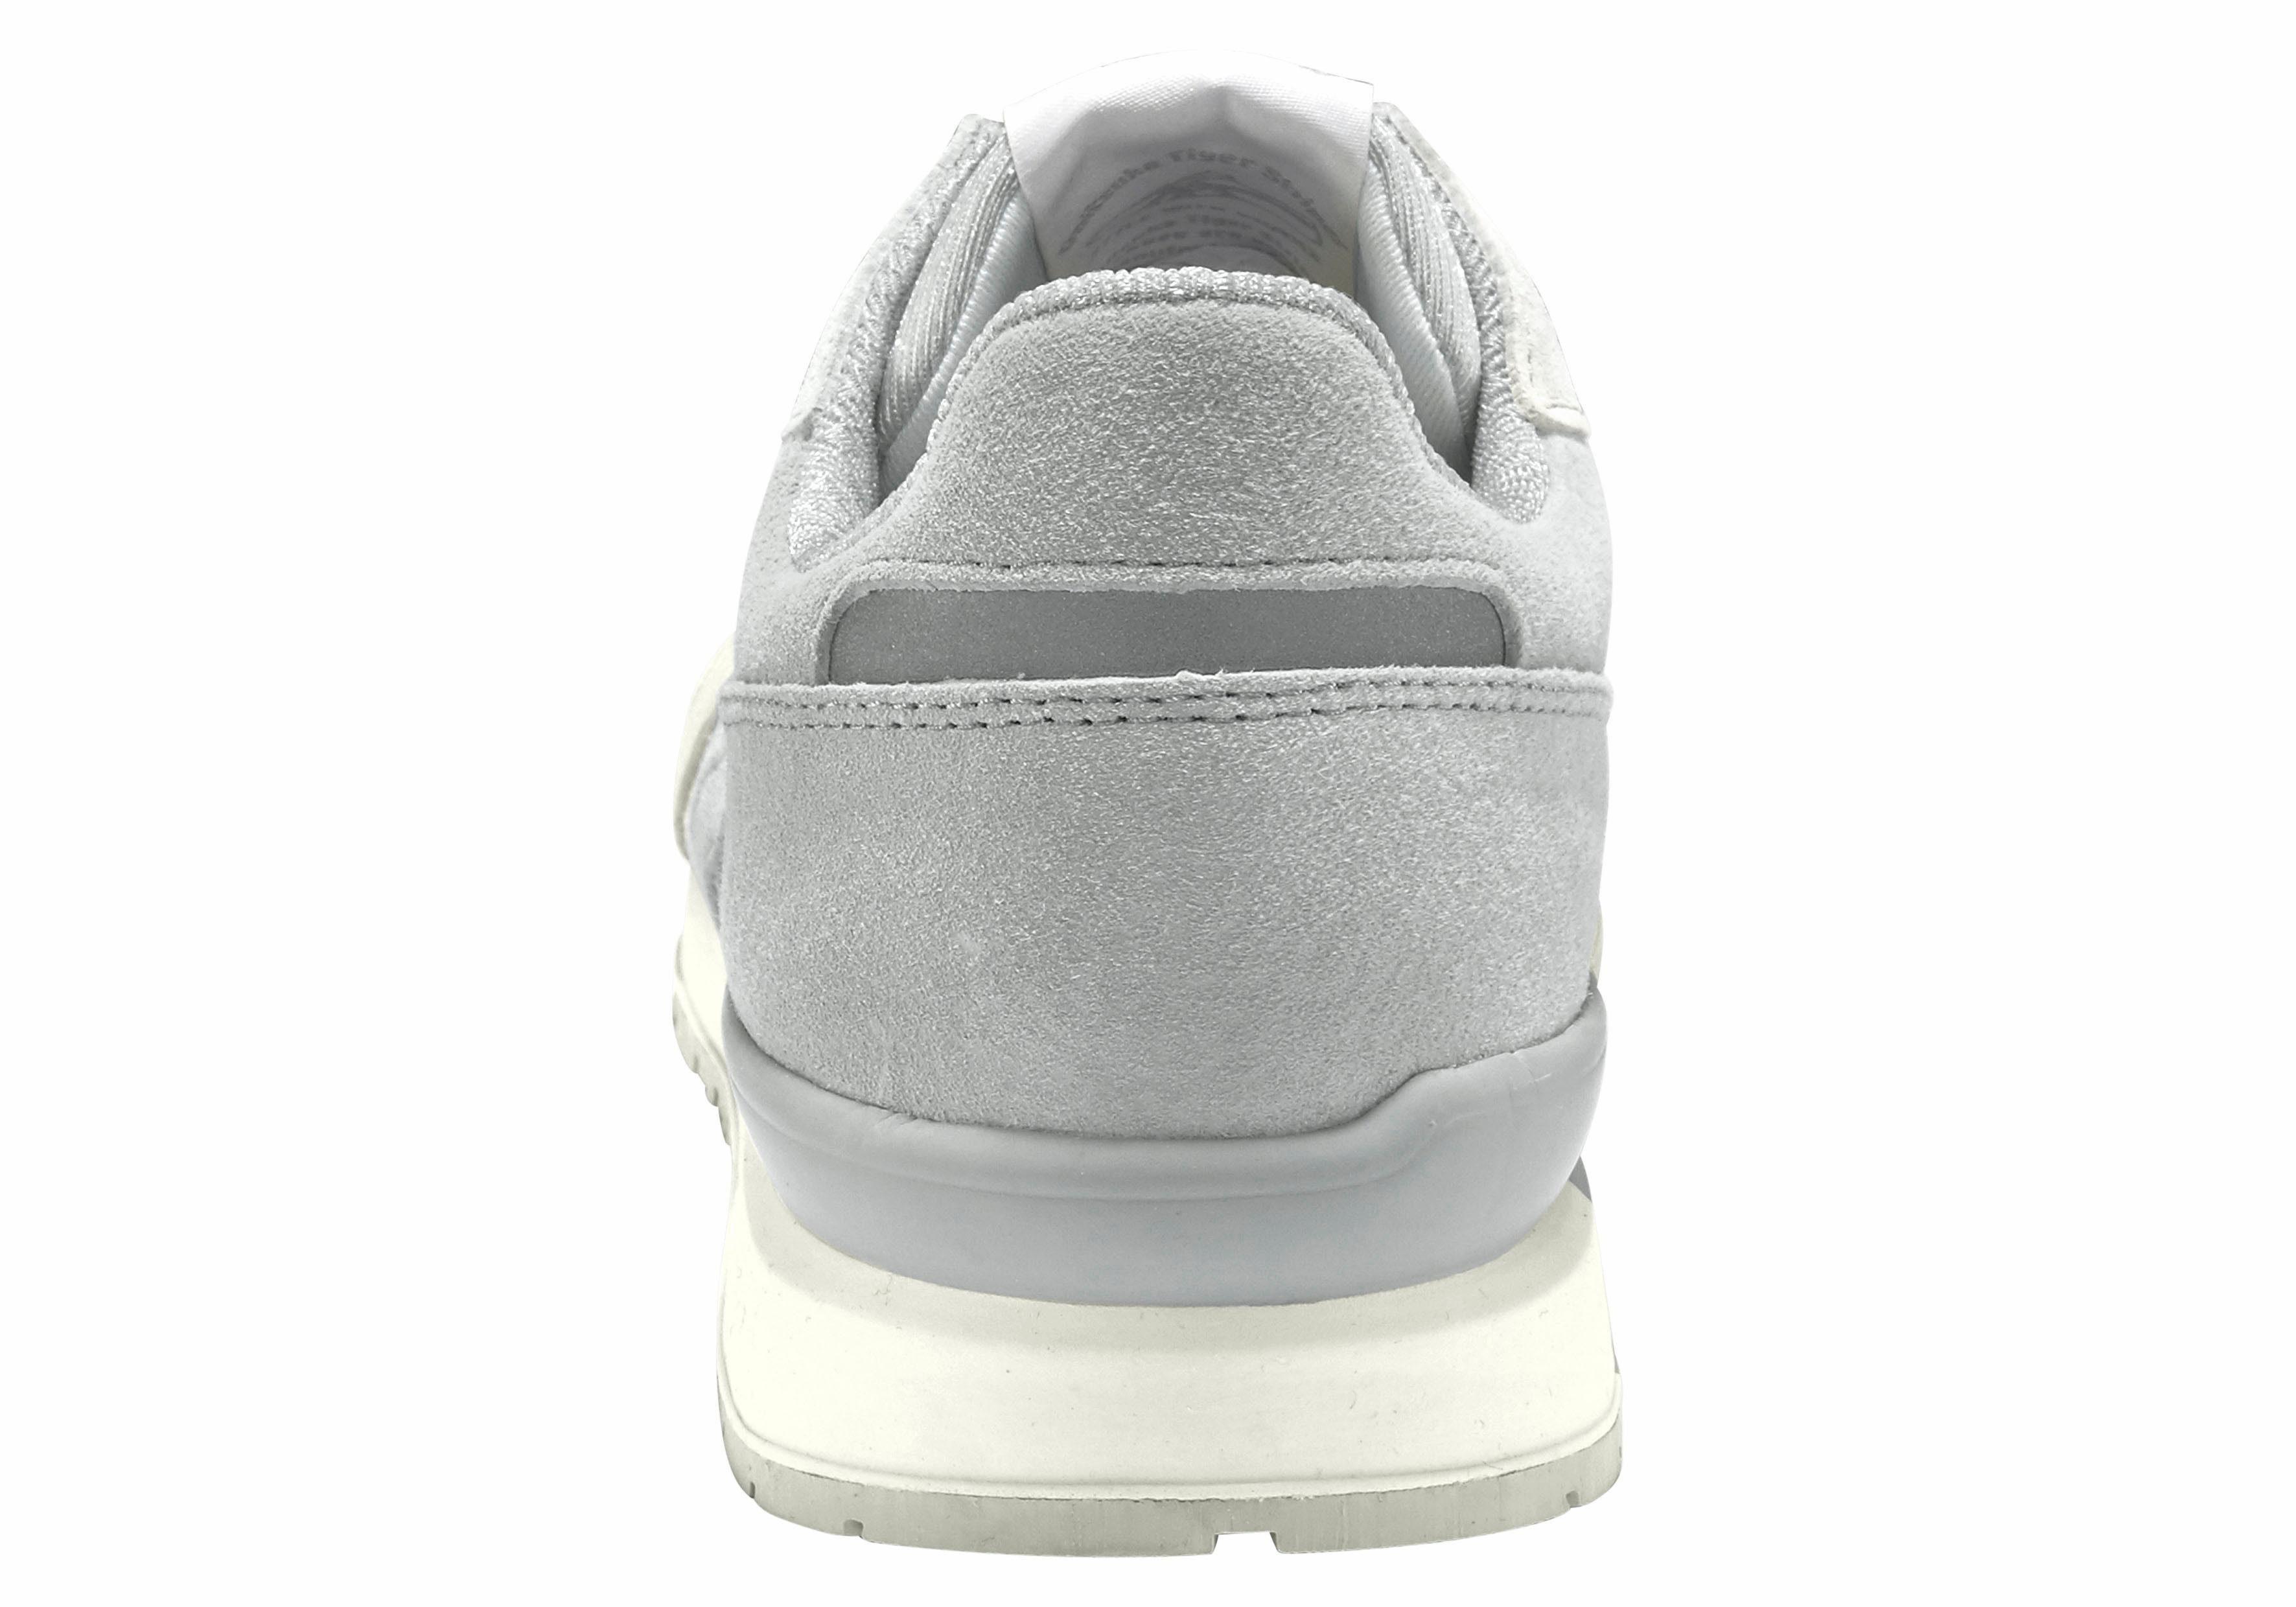 Kaufen 62680078 nr Unisex Sneaker Tiger Grau Onitsuka Ally Artikel OR6xzqIw